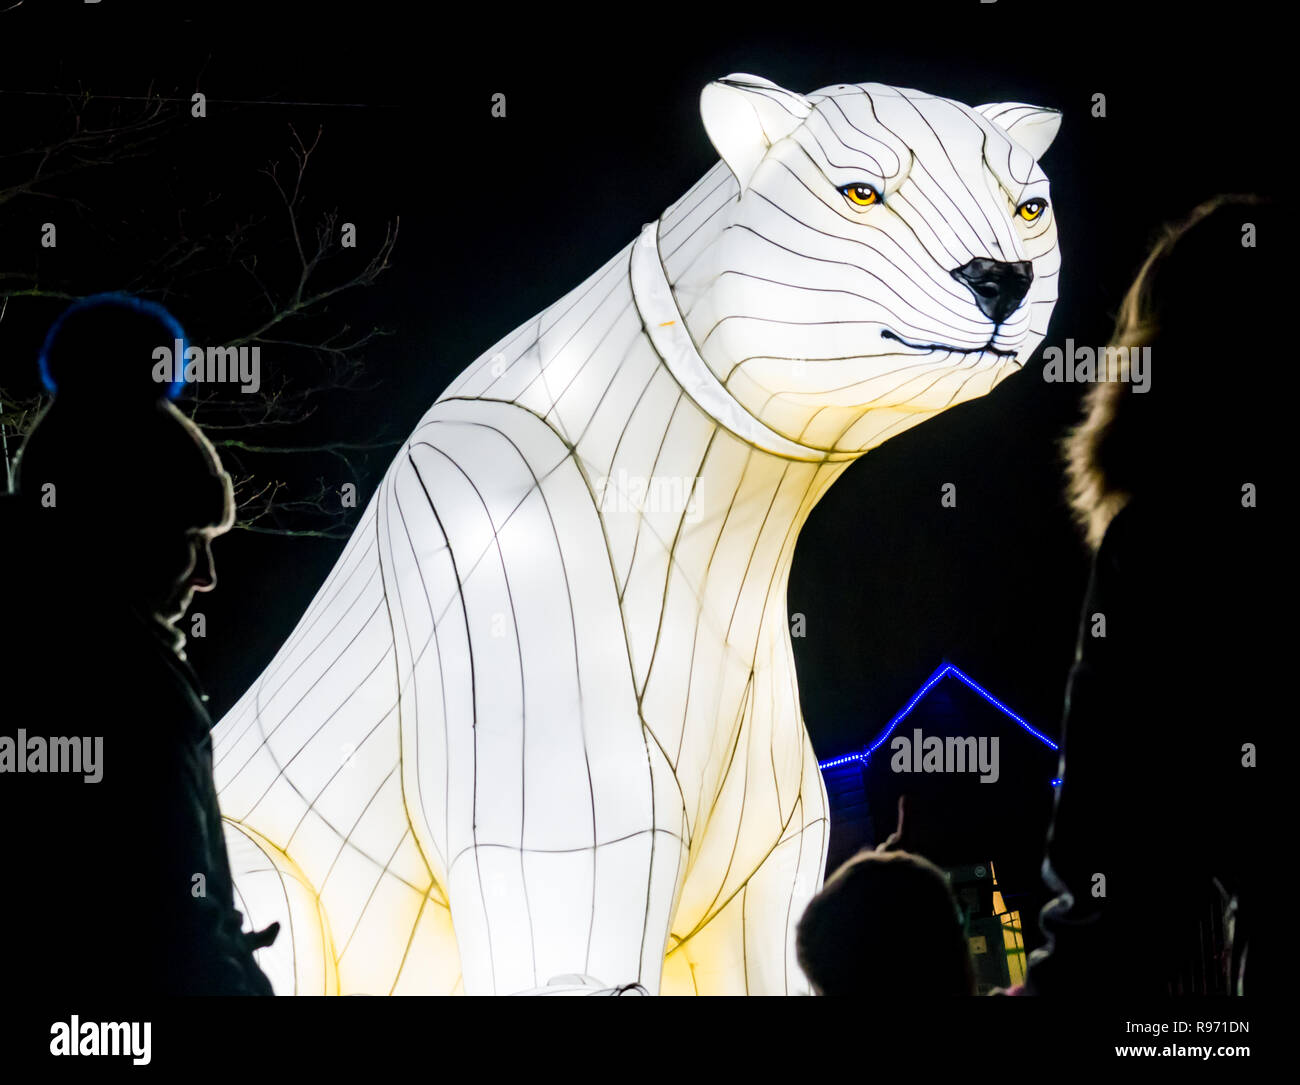 Christmas Polar Bear Display Stock Photos & Christmas